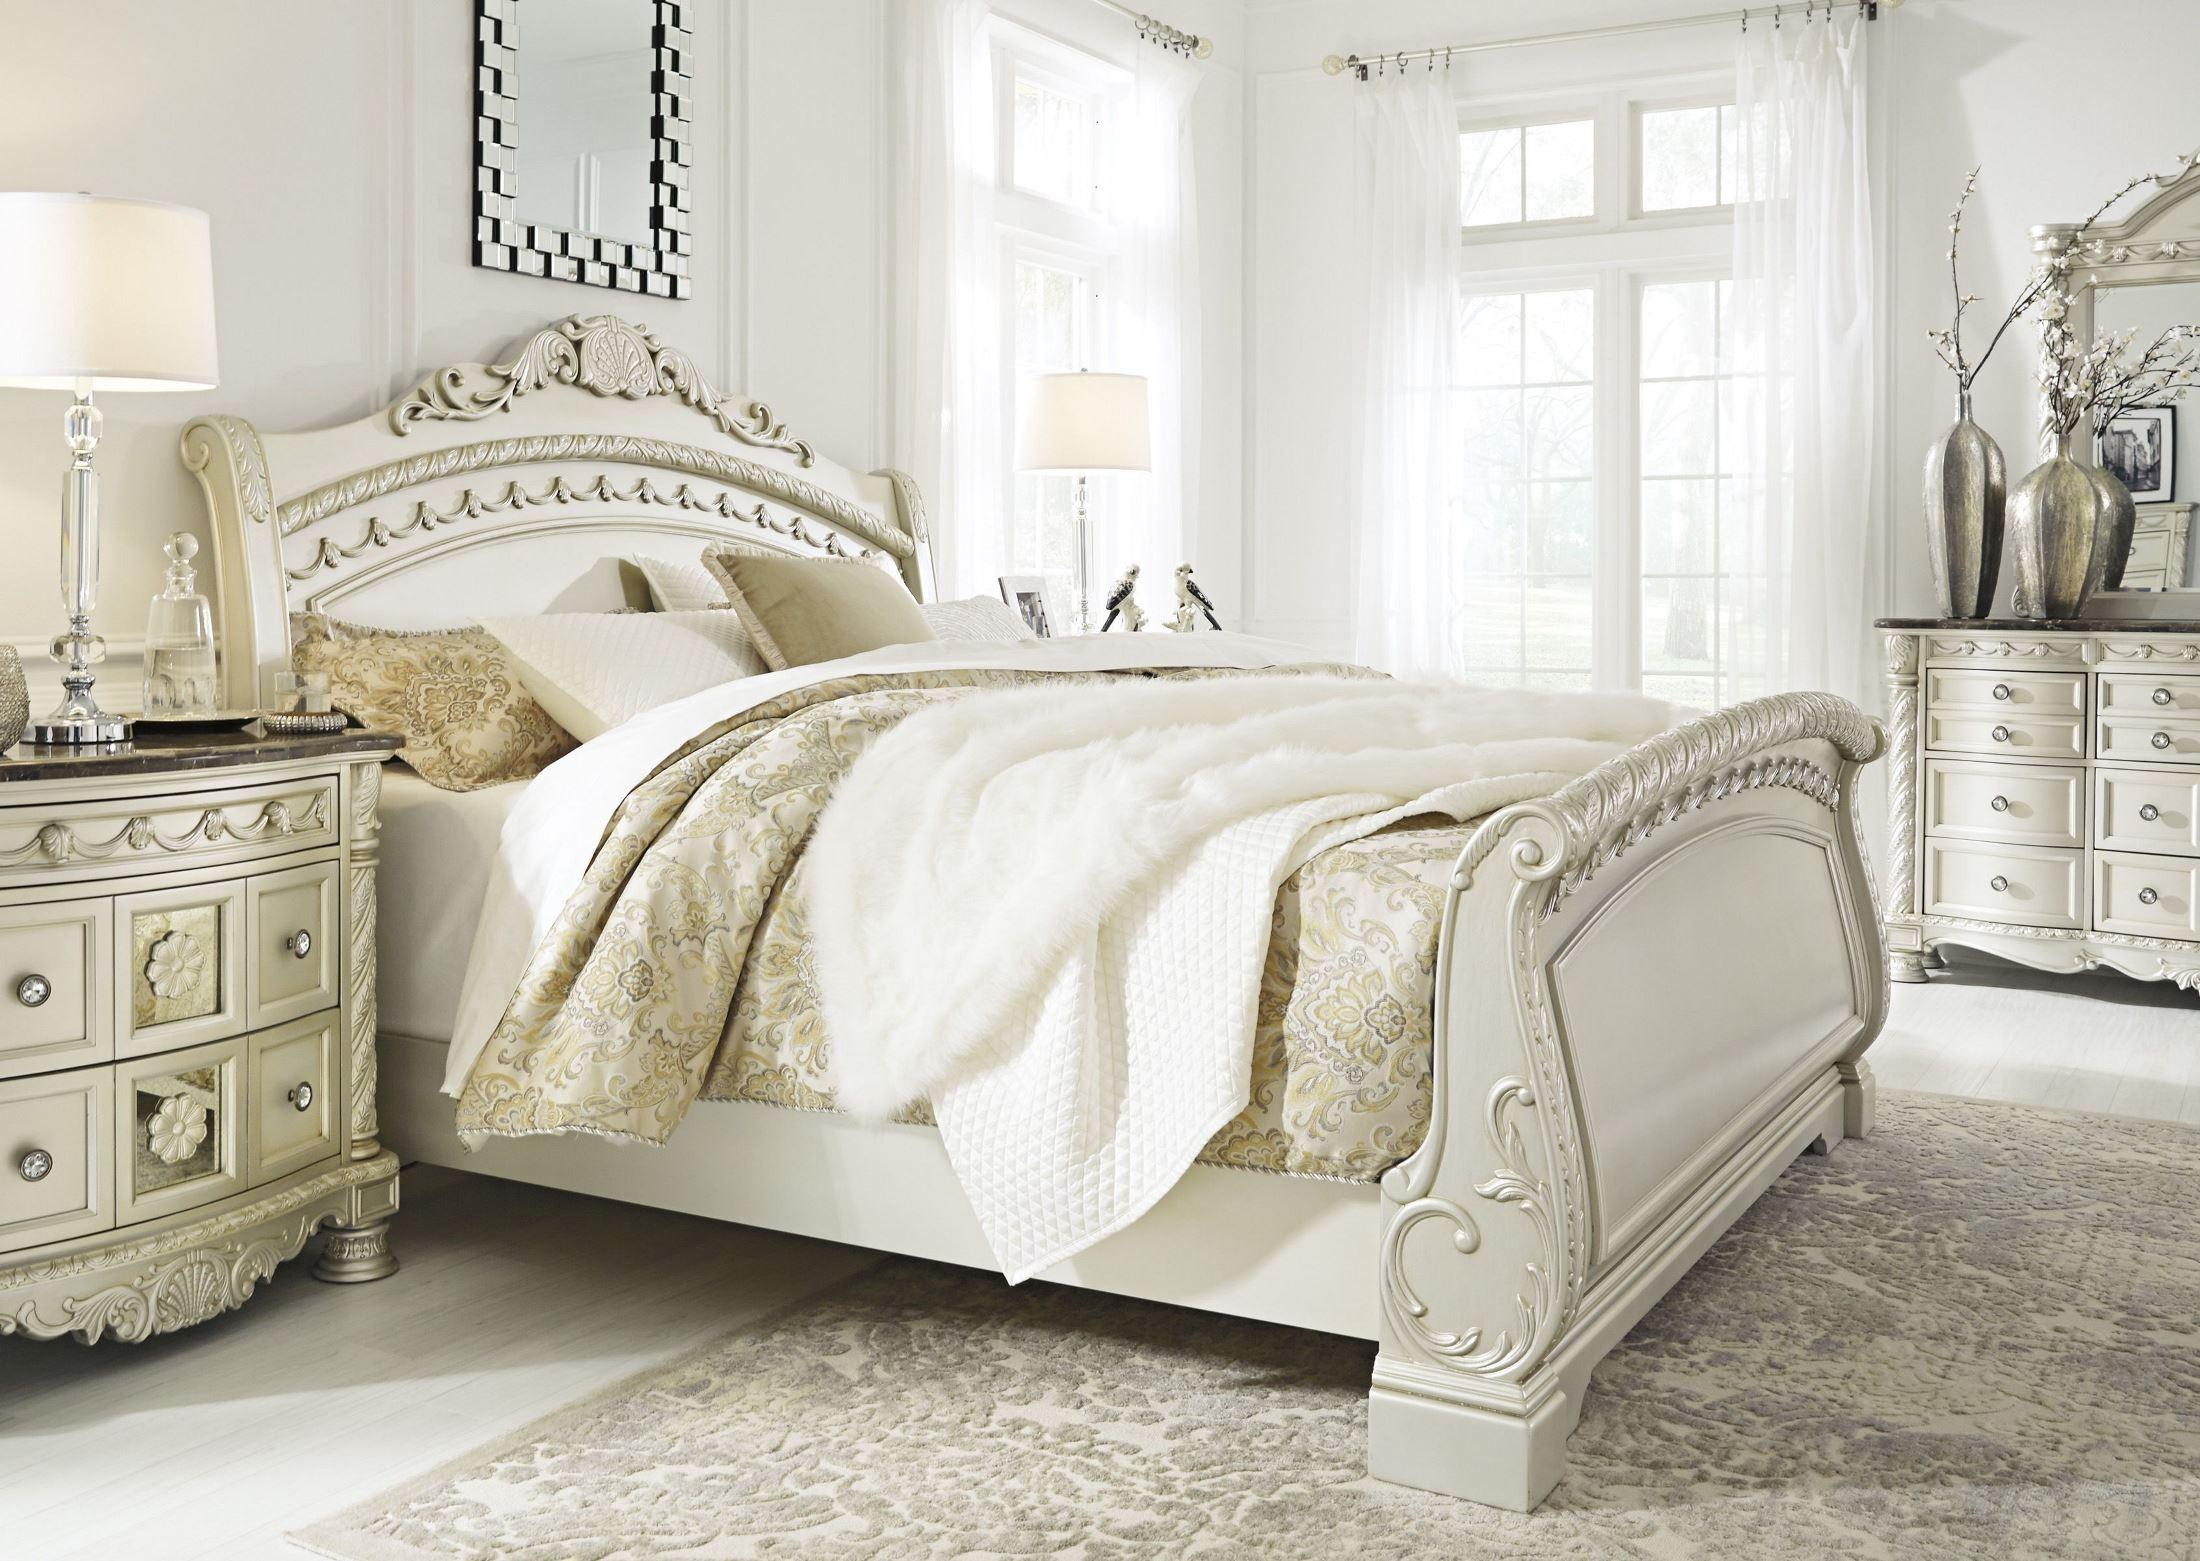 Cassimore north shore pearl silver cal king sleigh bed - North shore king sleigh bedroom set ...